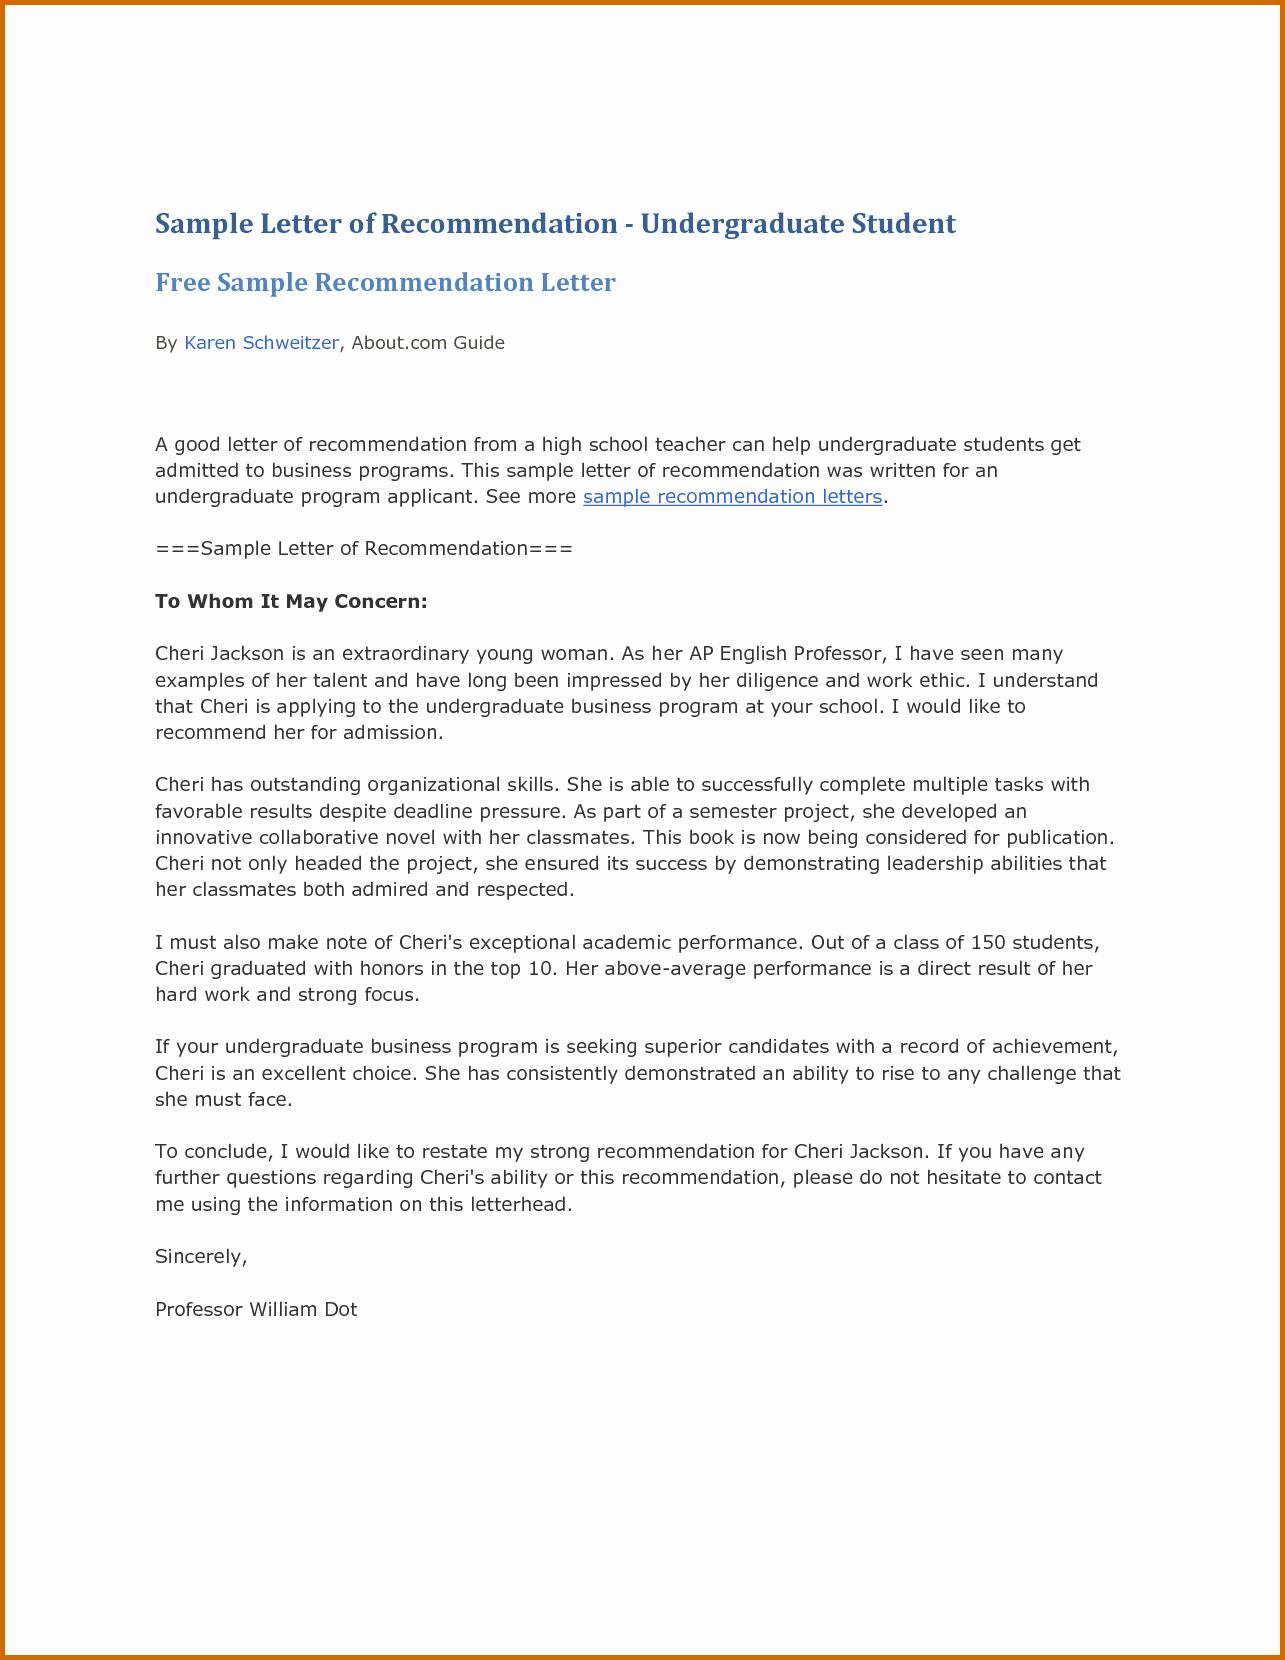 Recommendation Letter Template for Teacher Beautiful 13 Re Mendation Letter for Student Sample